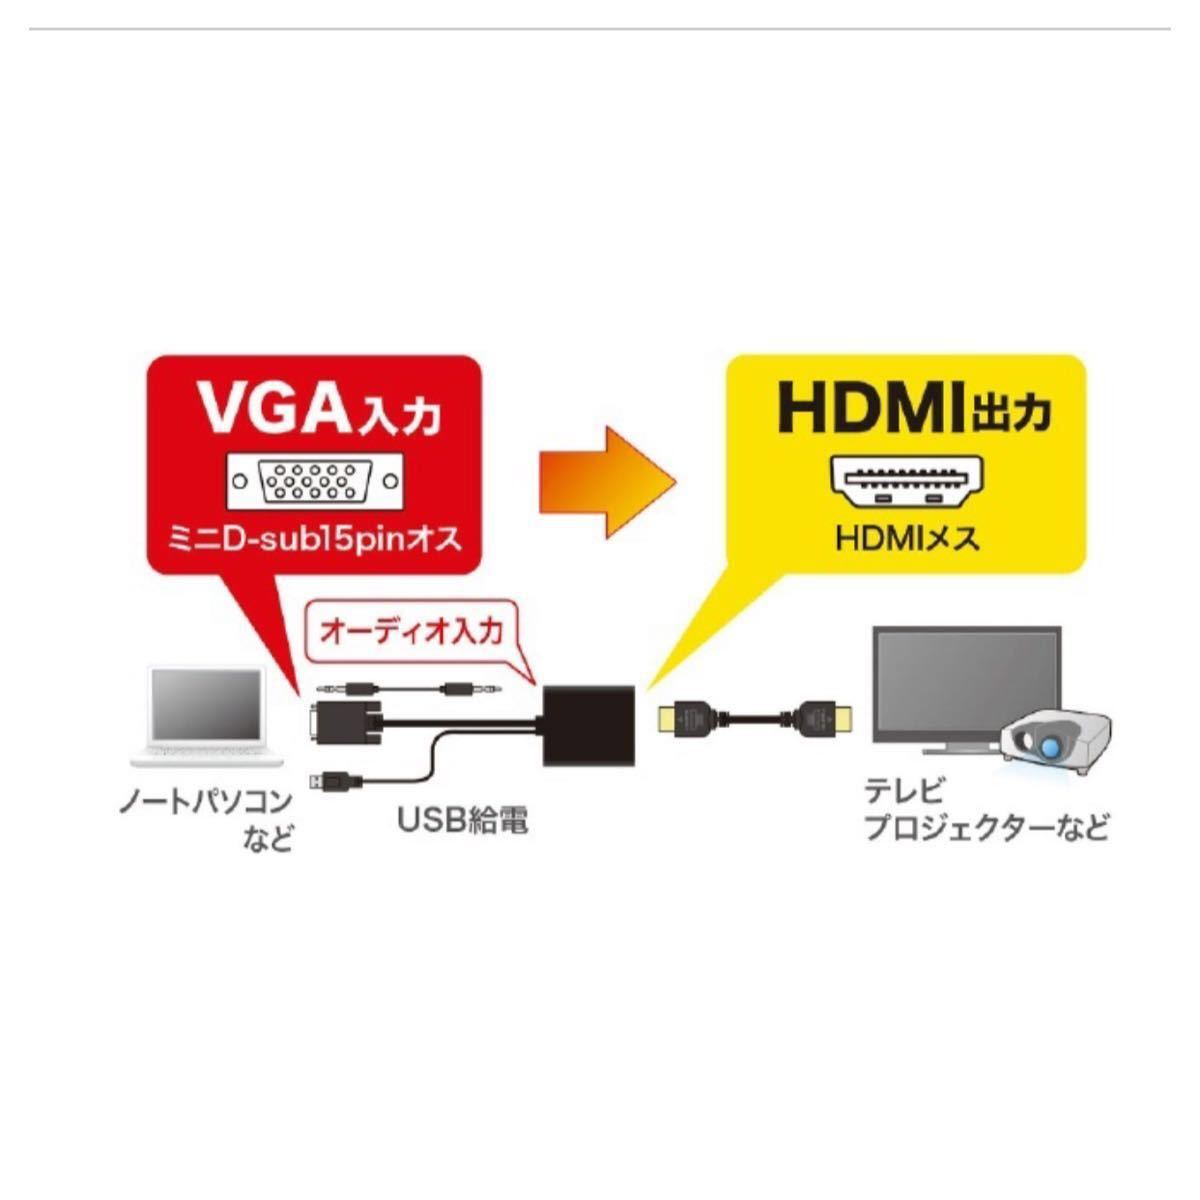 VGA信号HDMI変換コンバーター VGA-CVHD7